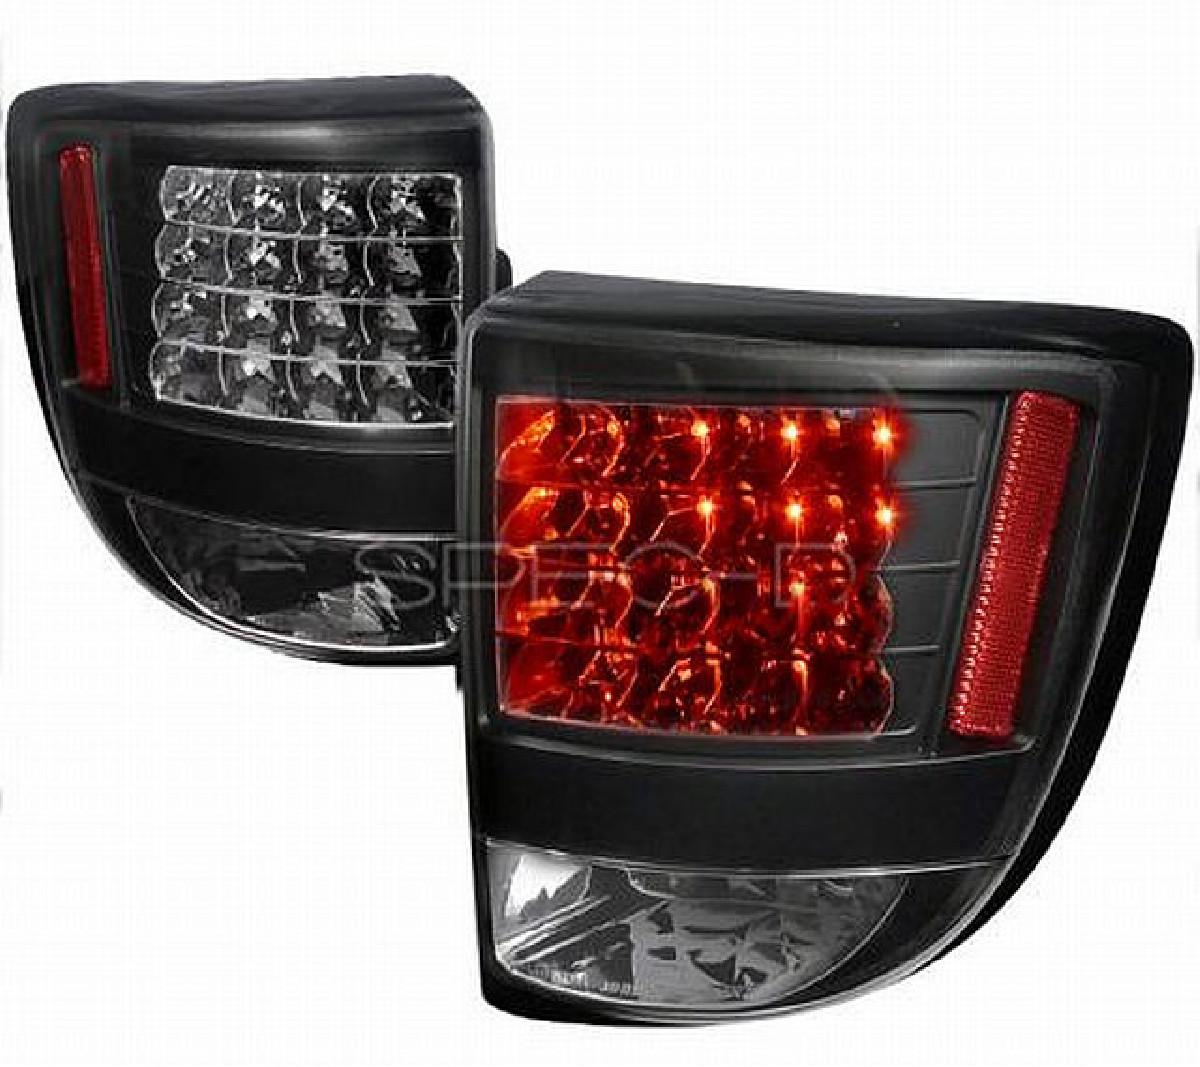 LED Rückleuchten Toyota Celica T23 99-05 Schwarz/Klar